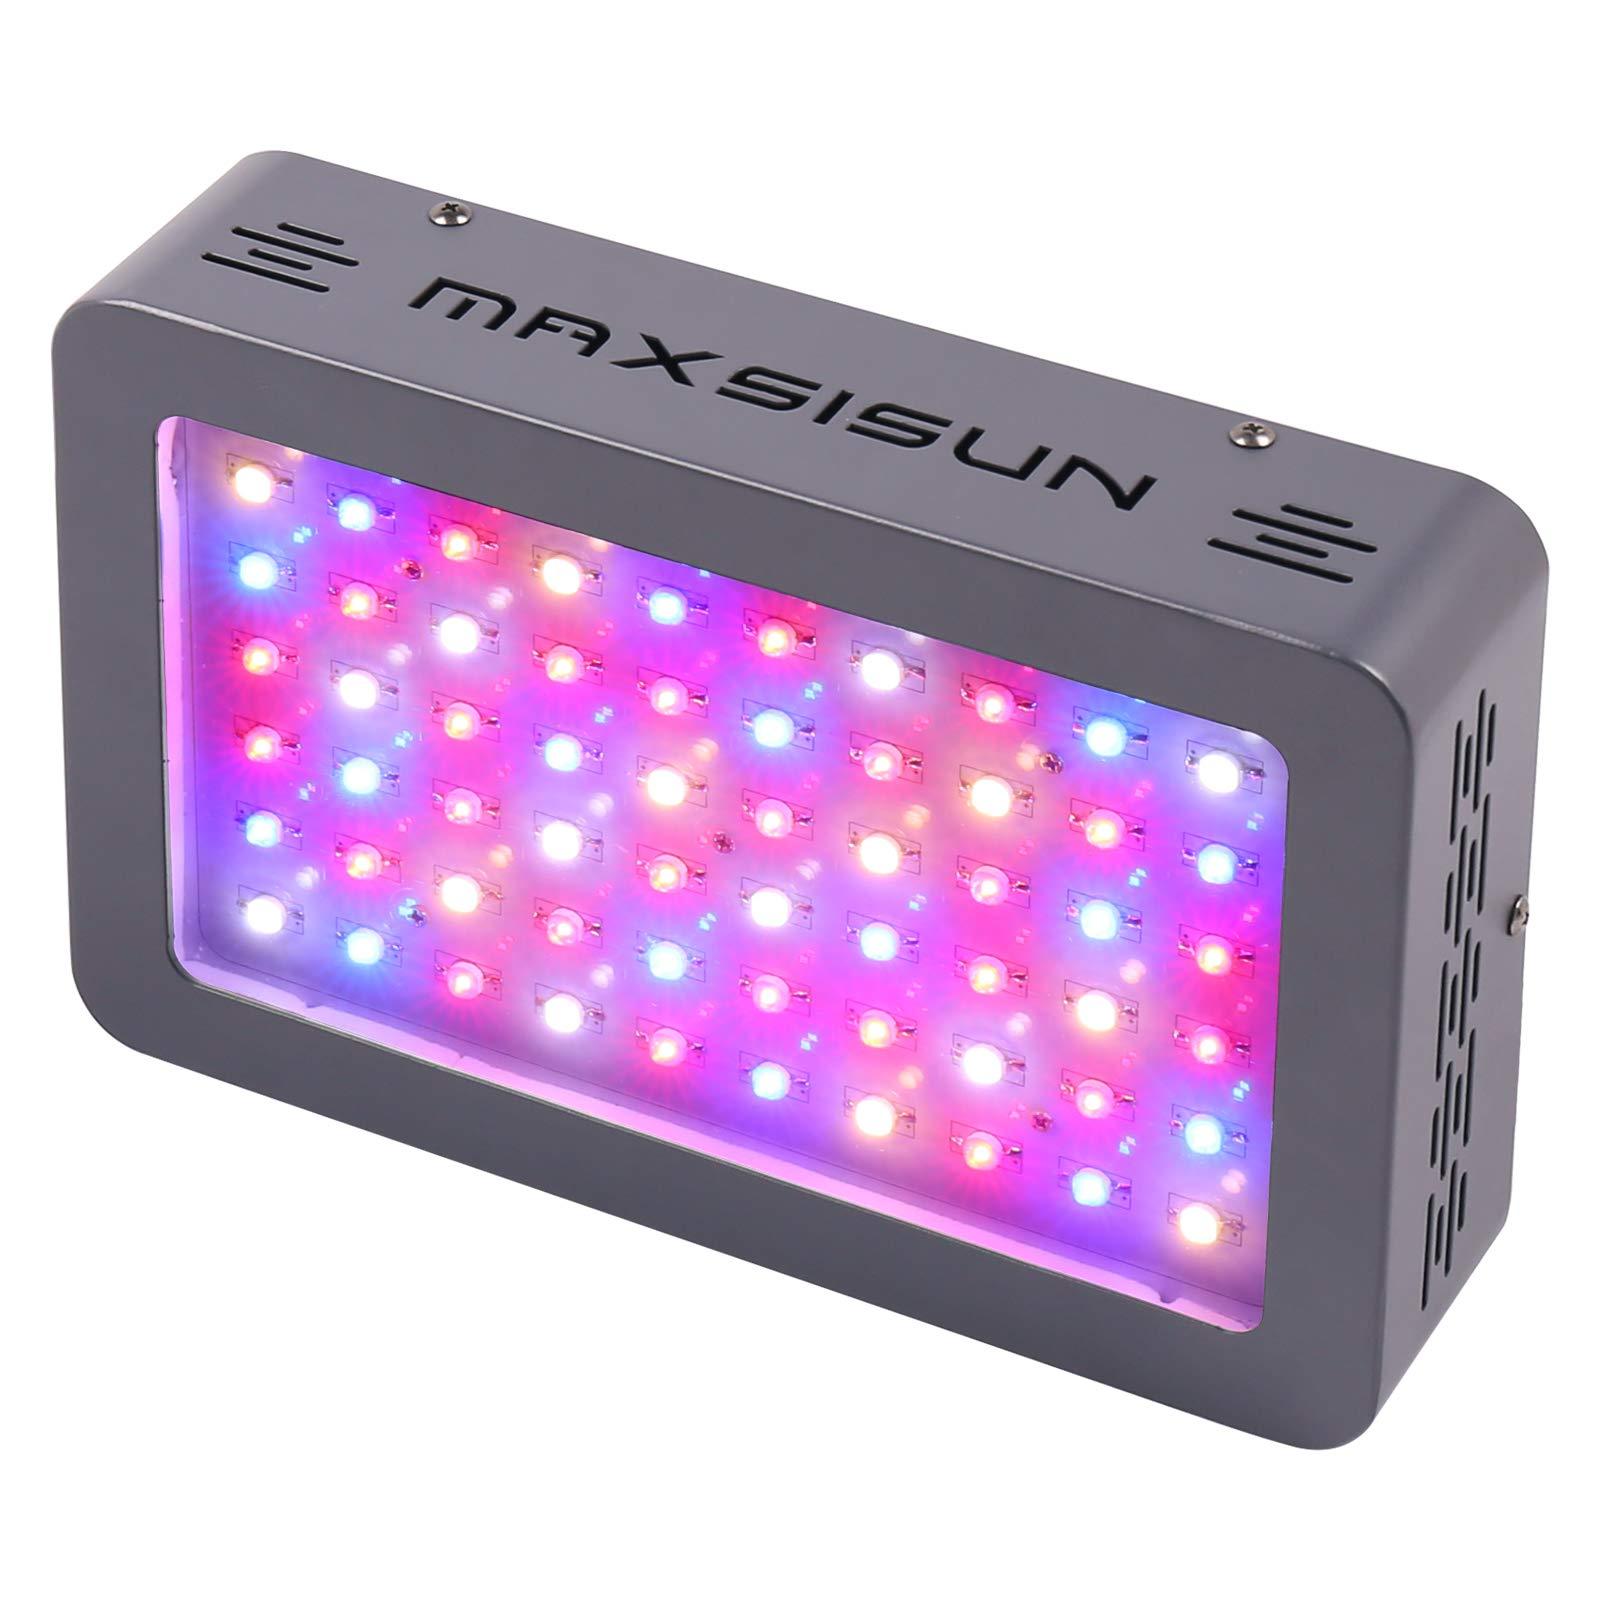 MAXSISUN 300W LED Grow Light Full Spectrum Growing Lights for Indoor Plants Veg and Flower